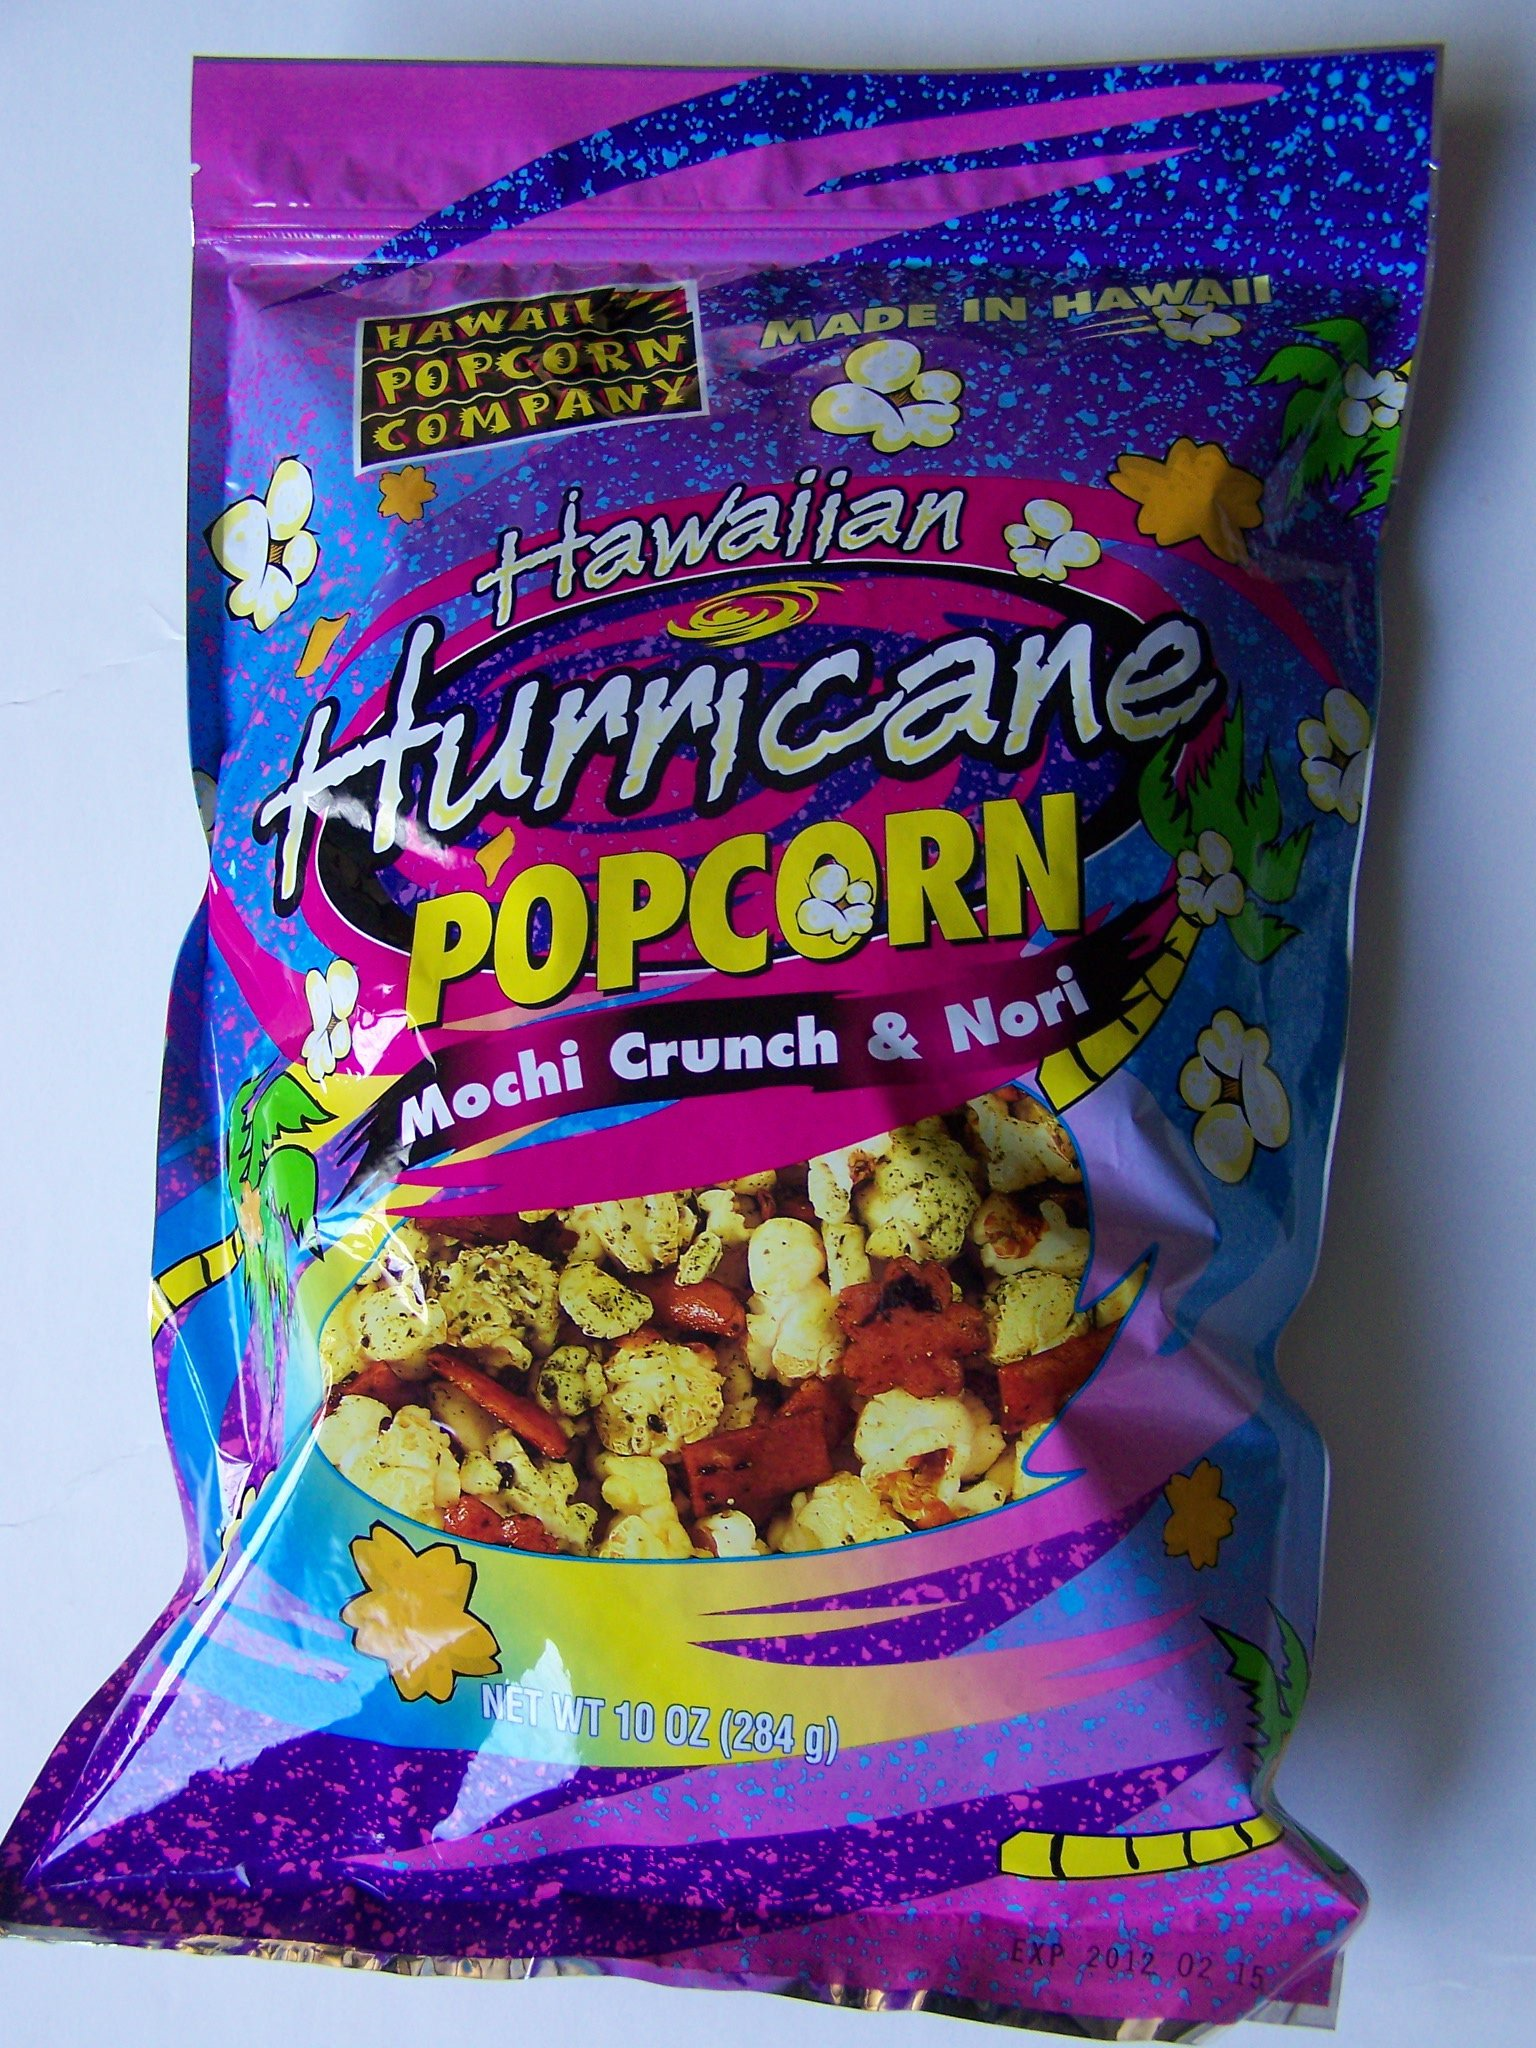 Hawaiian Hurricane Popcorn Mochi Crunch & Nori 10 Oz.